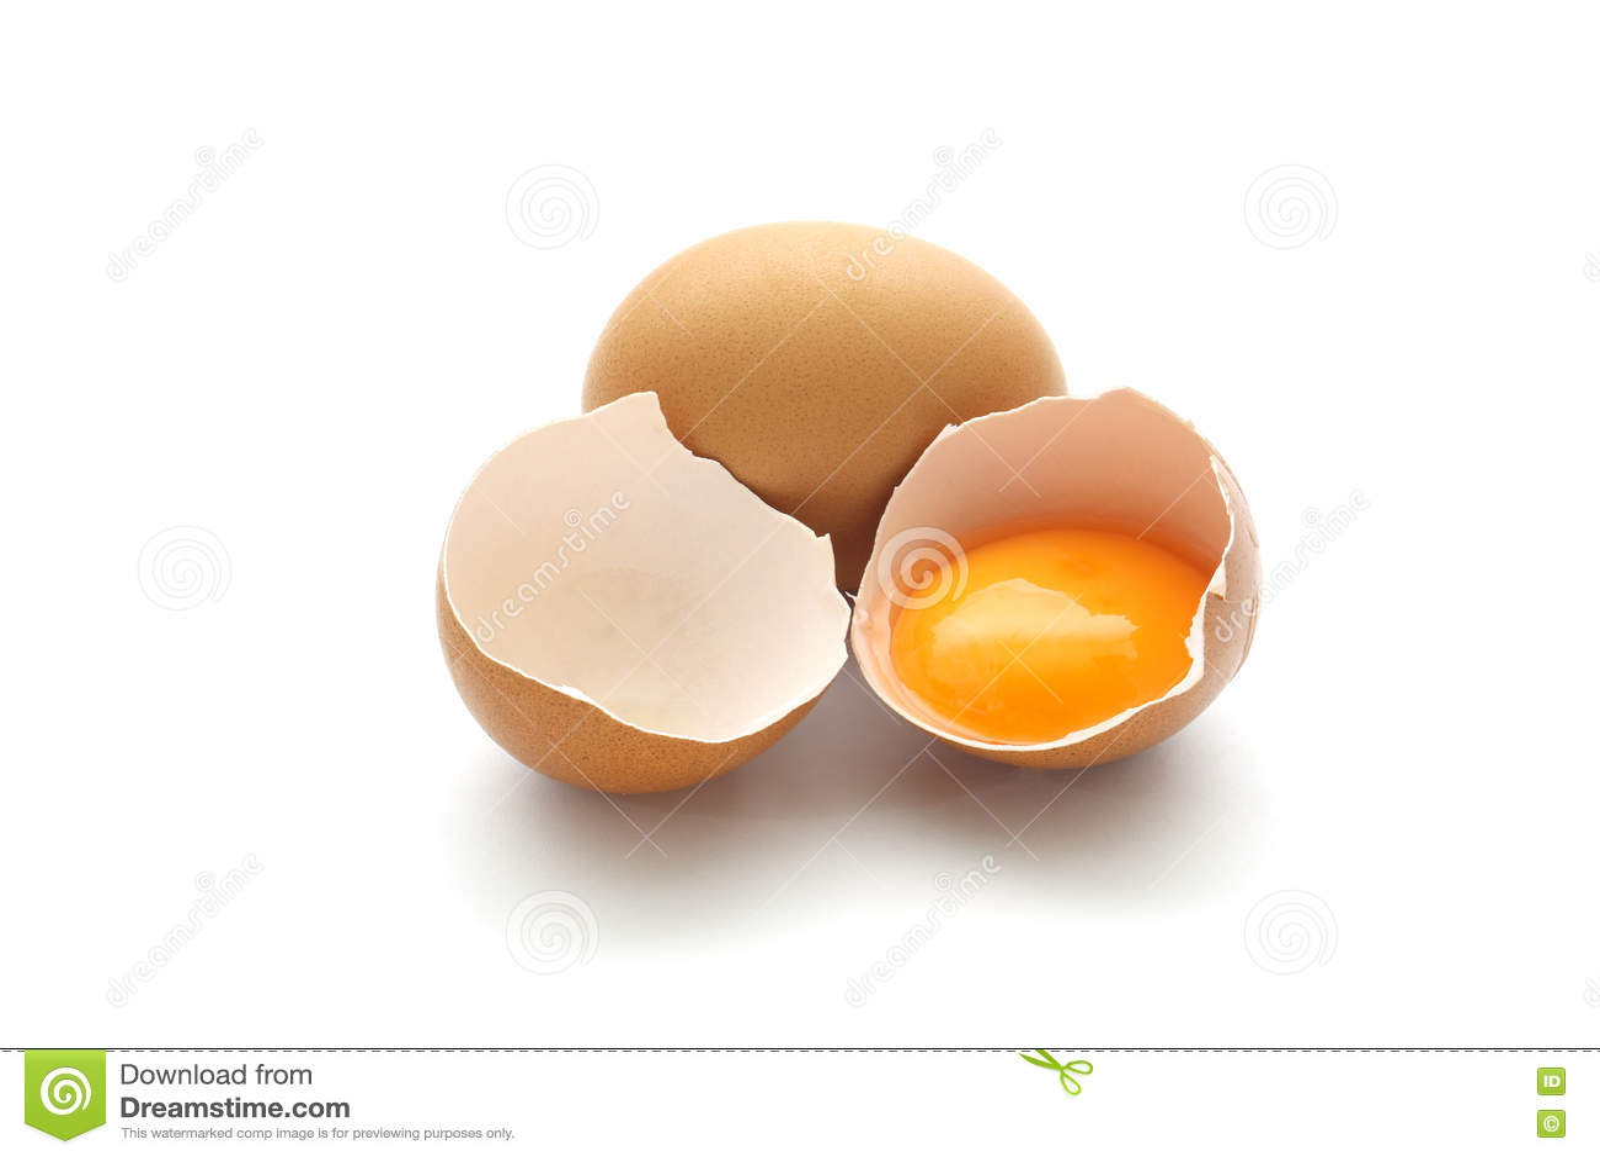 Close Up Broken Egg Isolated On White Background Stock Photo